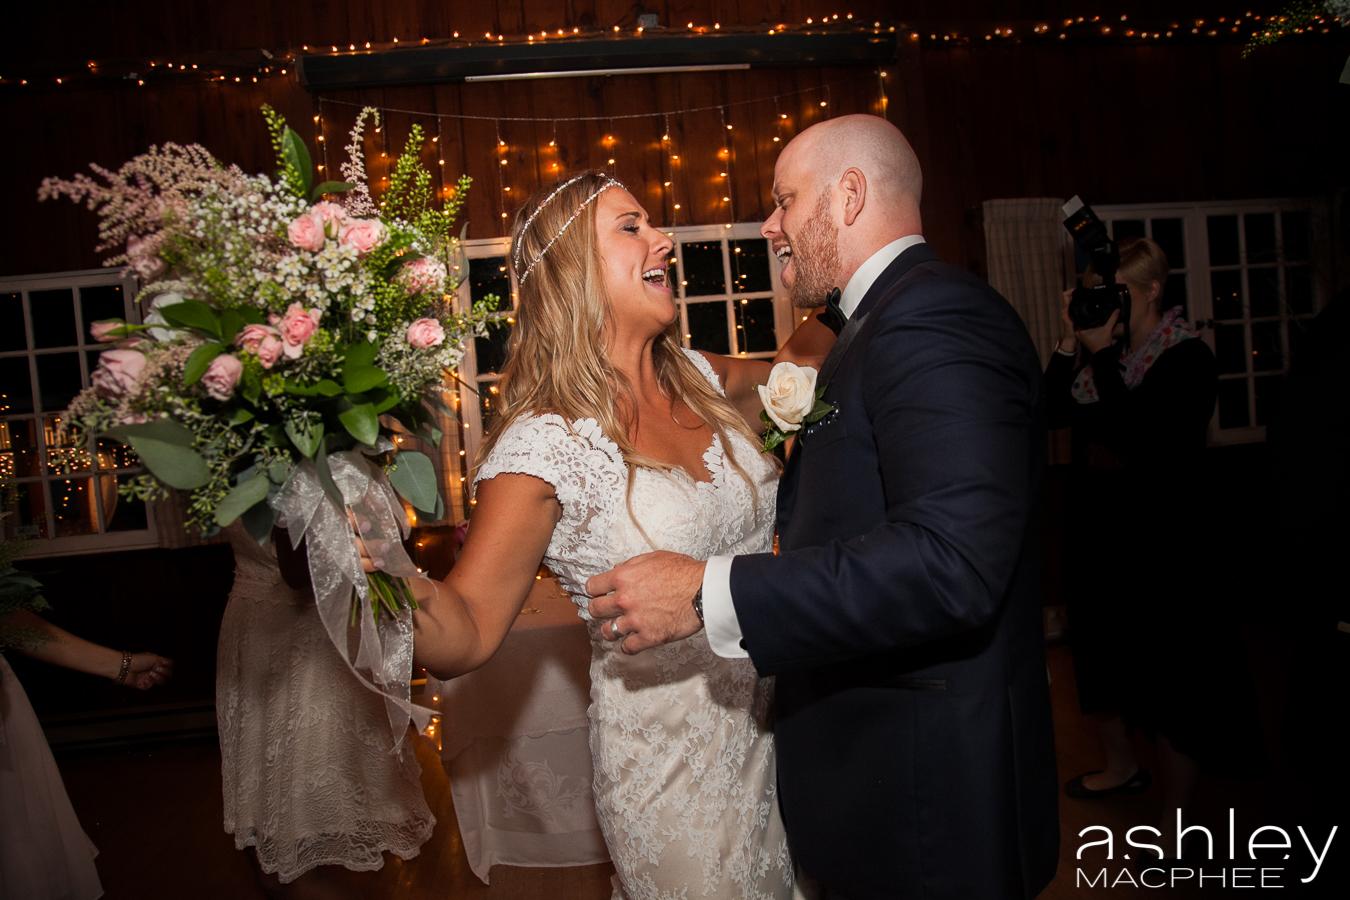 Ashley MacPhee Photography Hudson Yacht Club wedding photographer (84 of 112).jpg